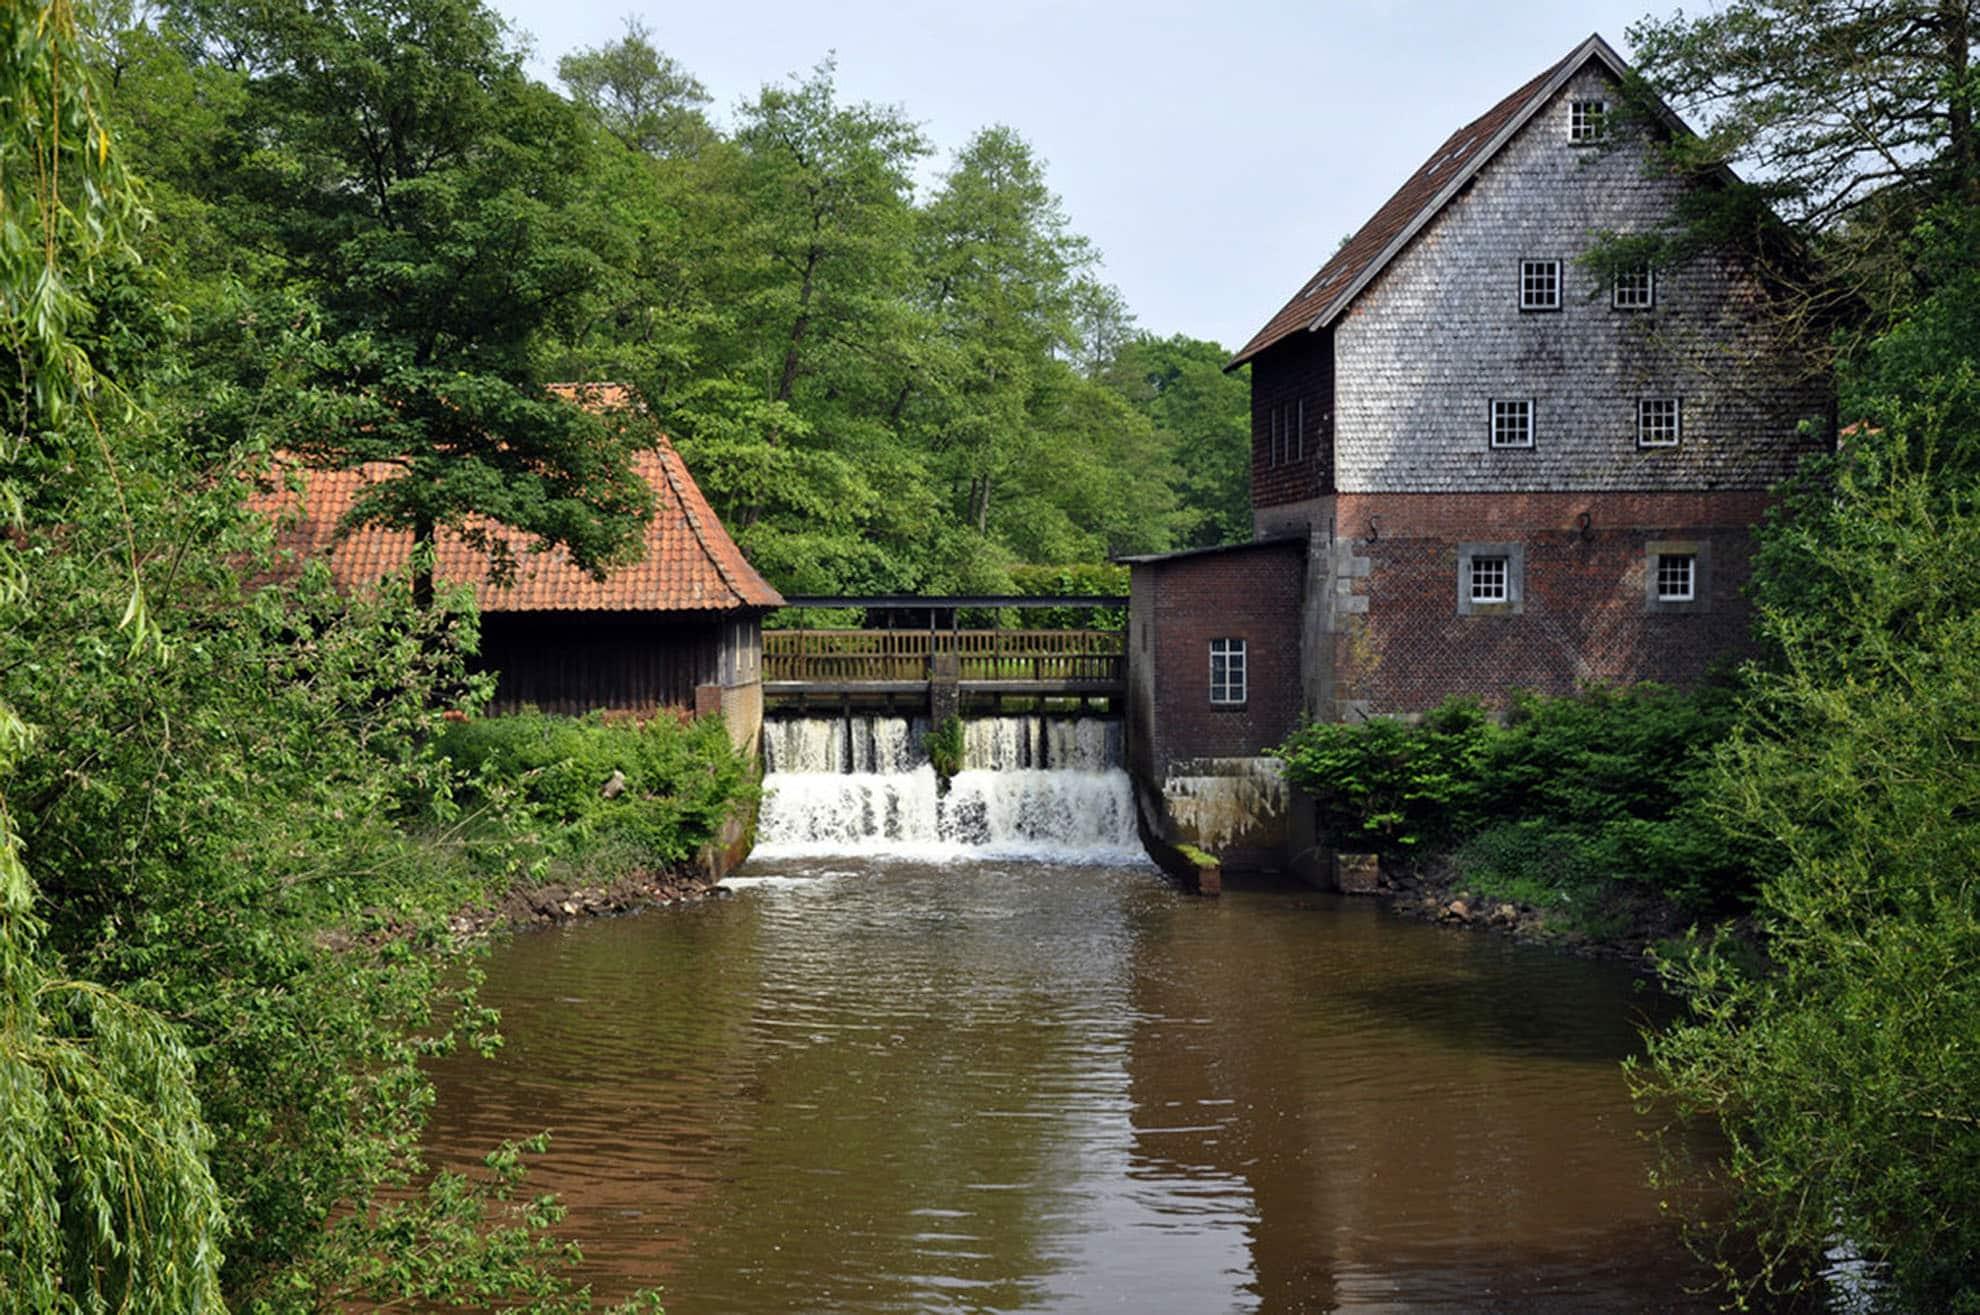 Familotel Gut Landegge Umgebung Meppen Familienurlaub im Emsland